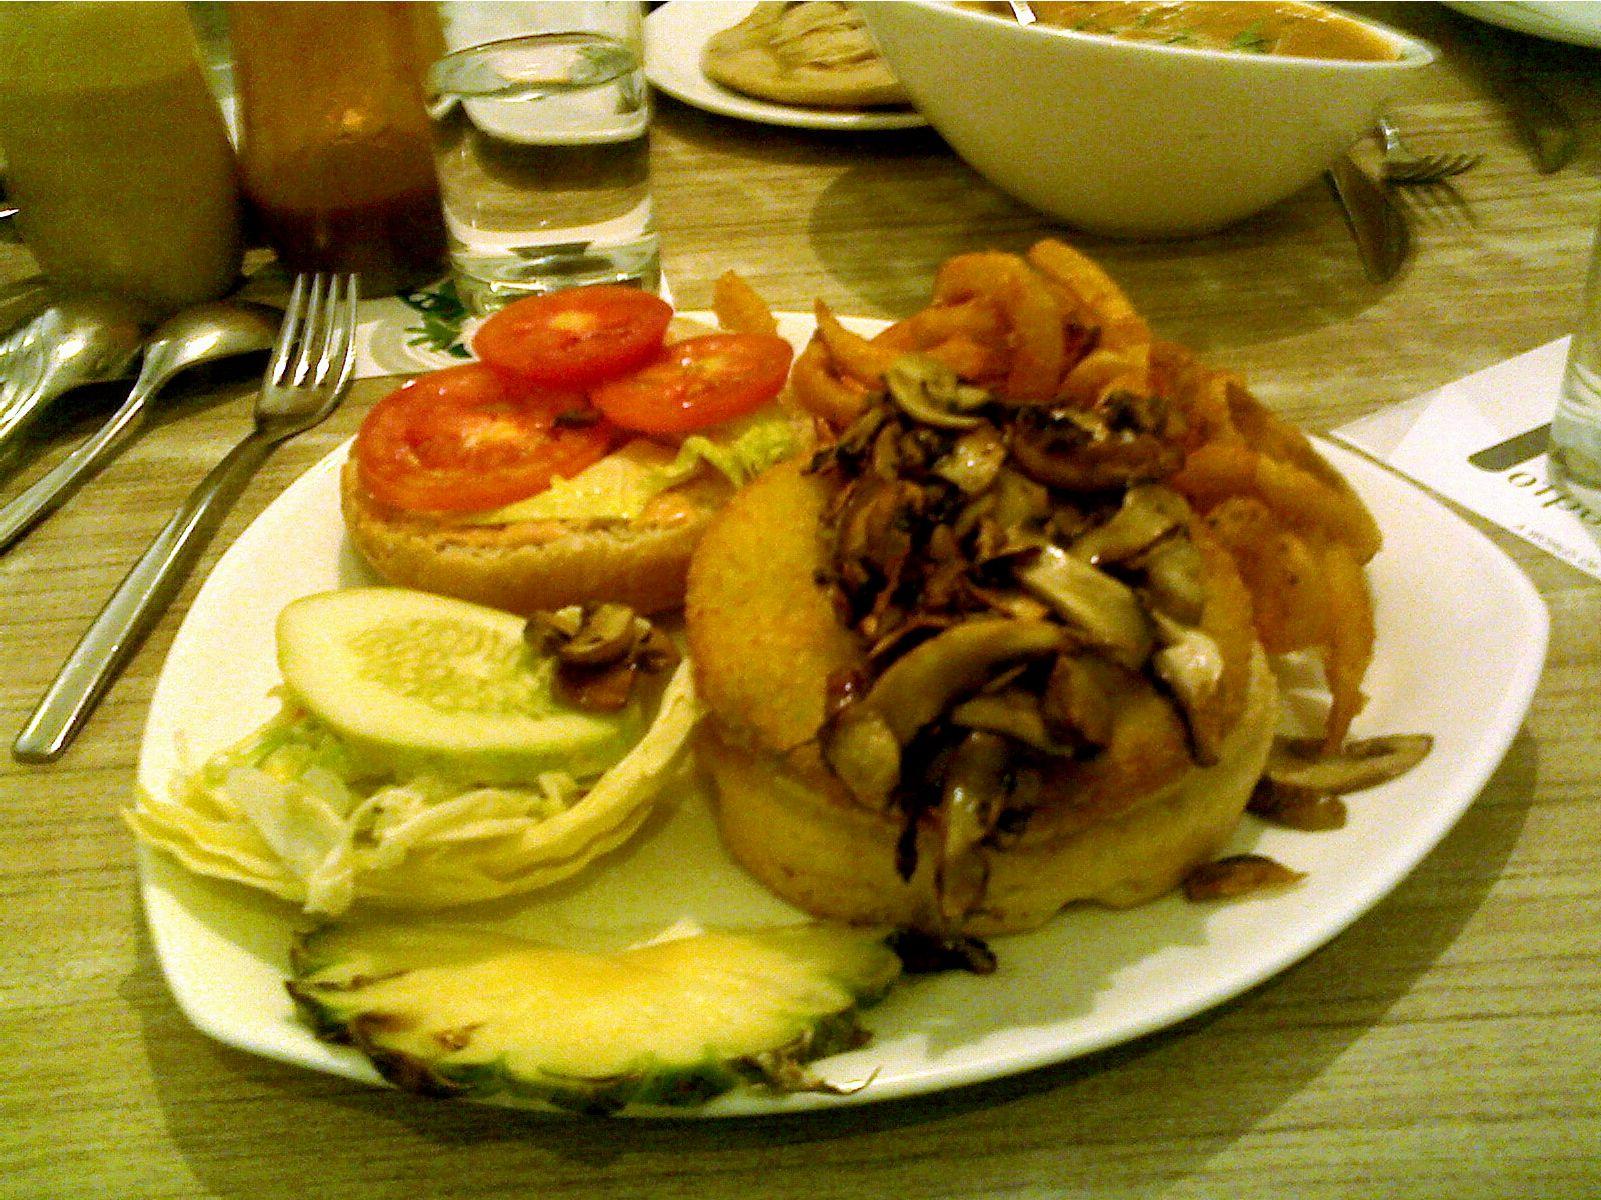 Gourmet vegetable burger